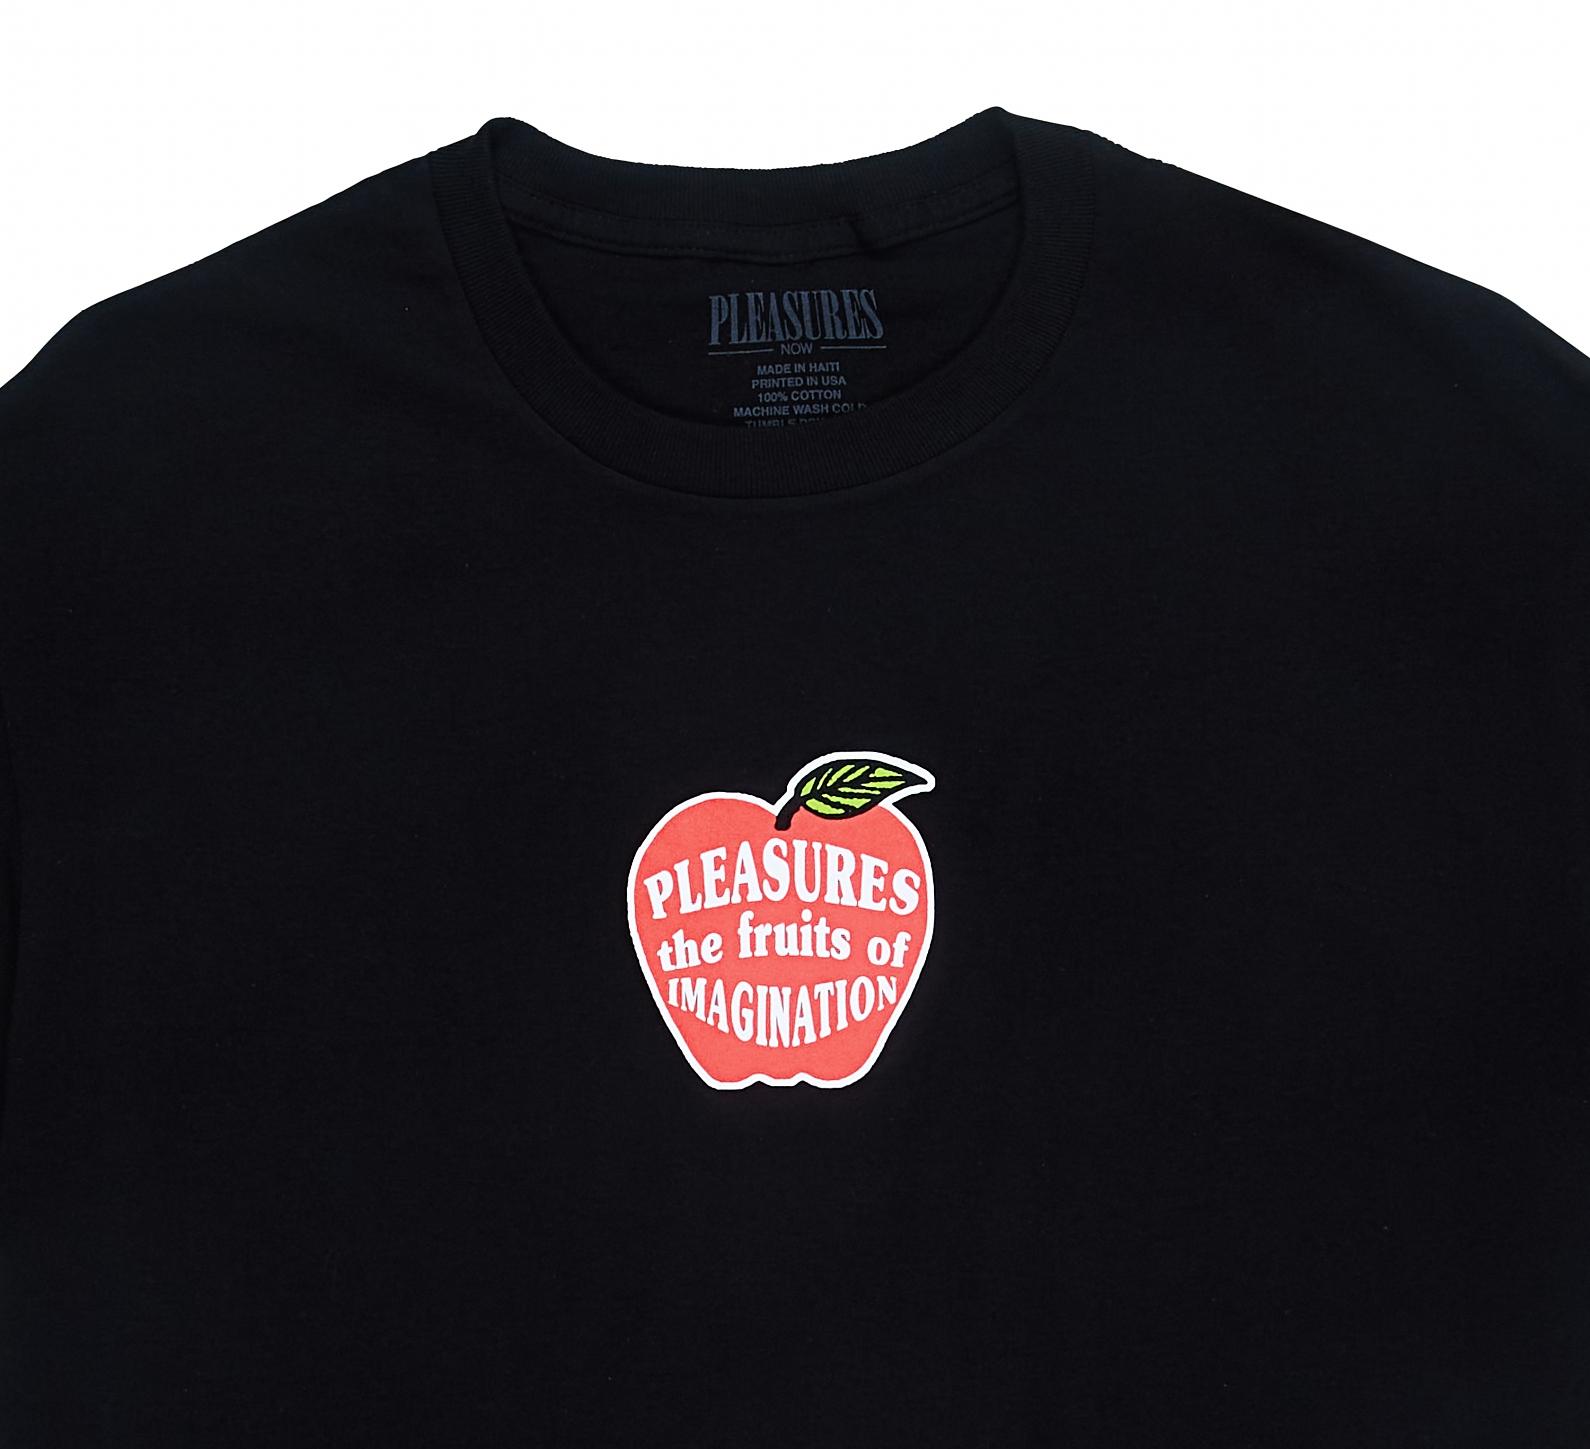 【PLEASURES/プレジャーズ】IMAGINATION T-SHIRT Tシャツ / BLACK